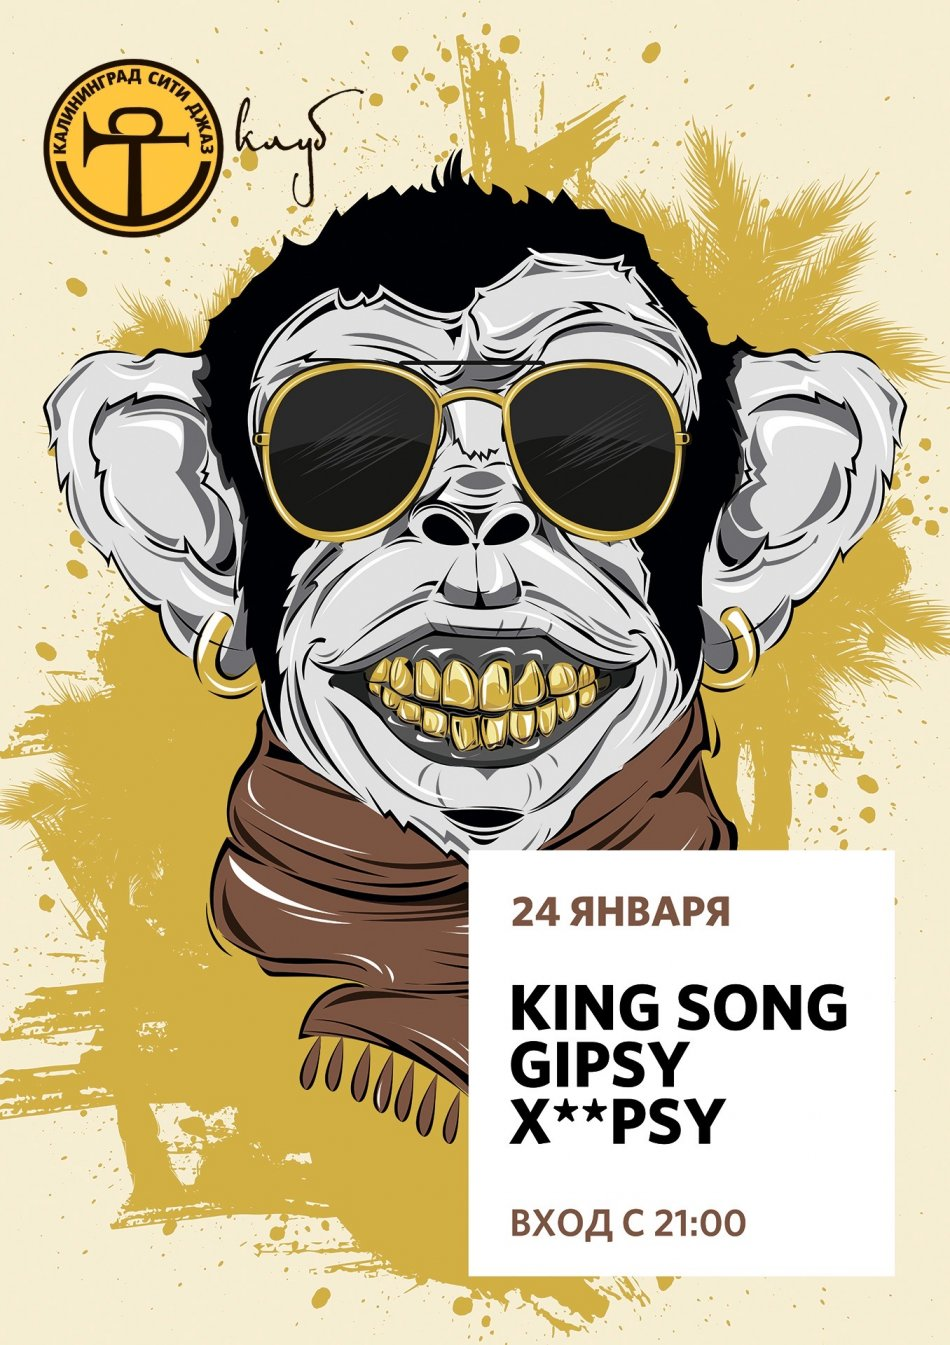 King Song Gipsy X**psy